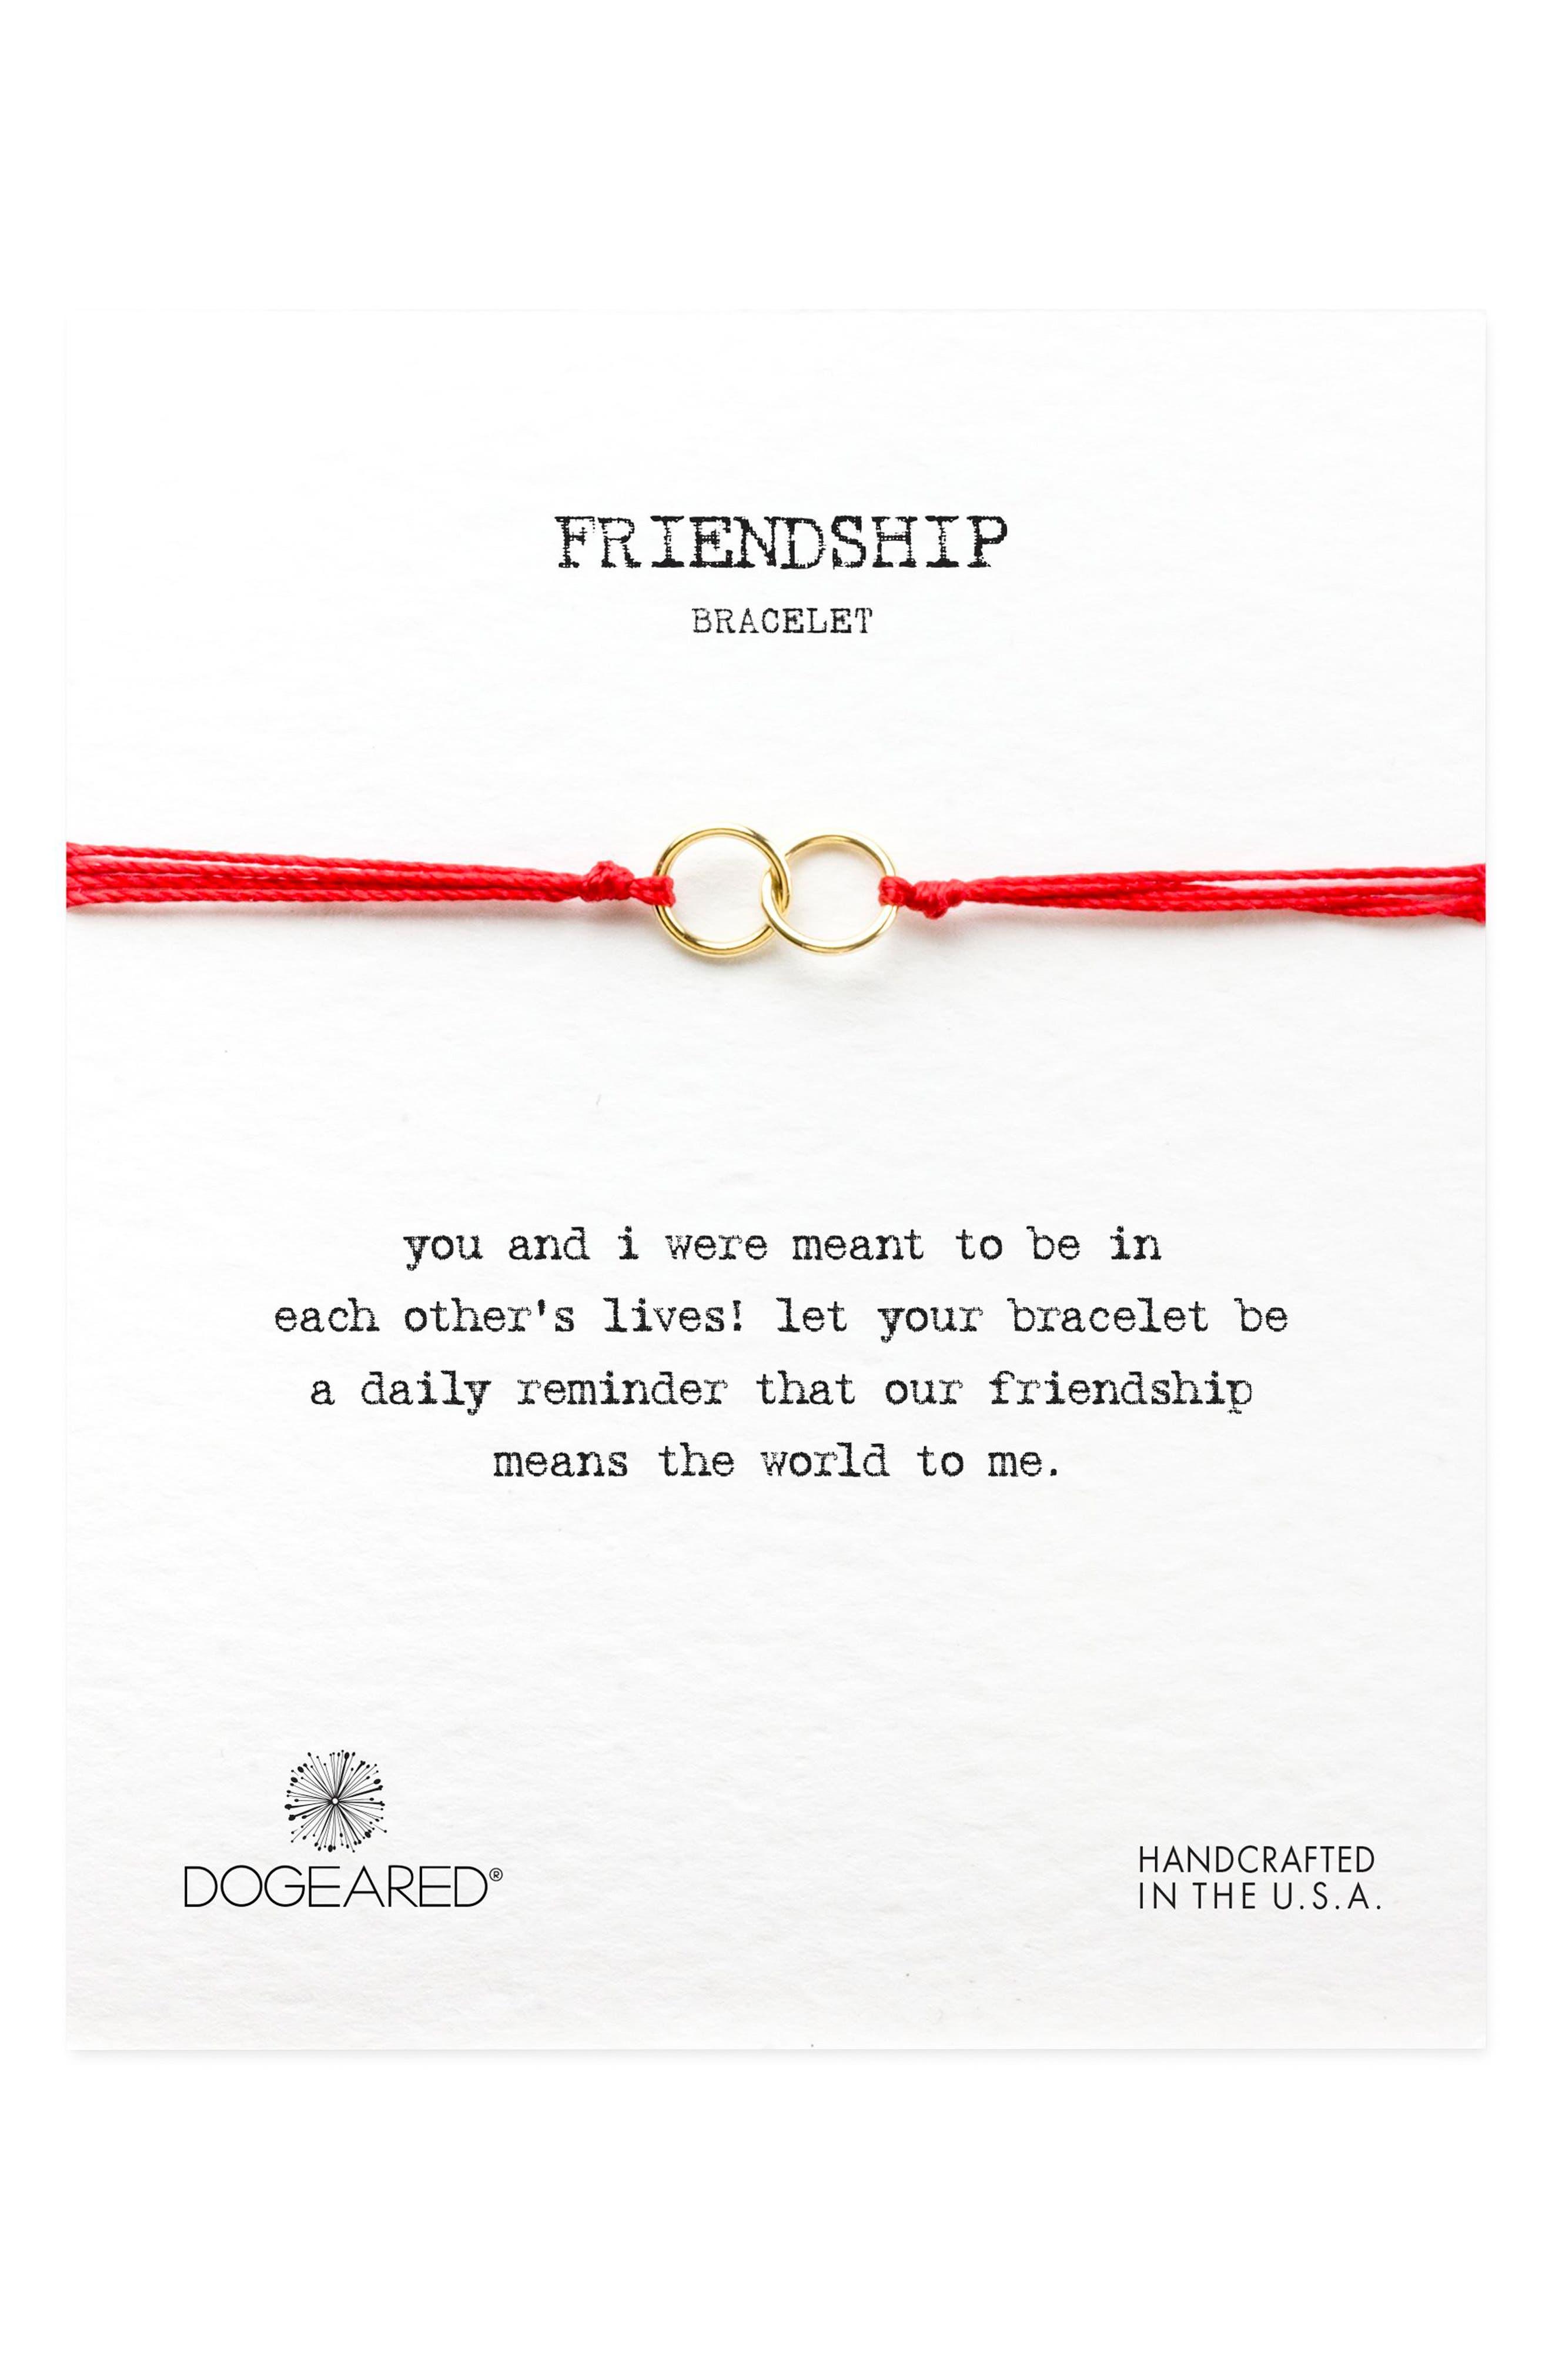 Double Linked Friendship Bracelet,                         Main,                         color, RED / GOLD